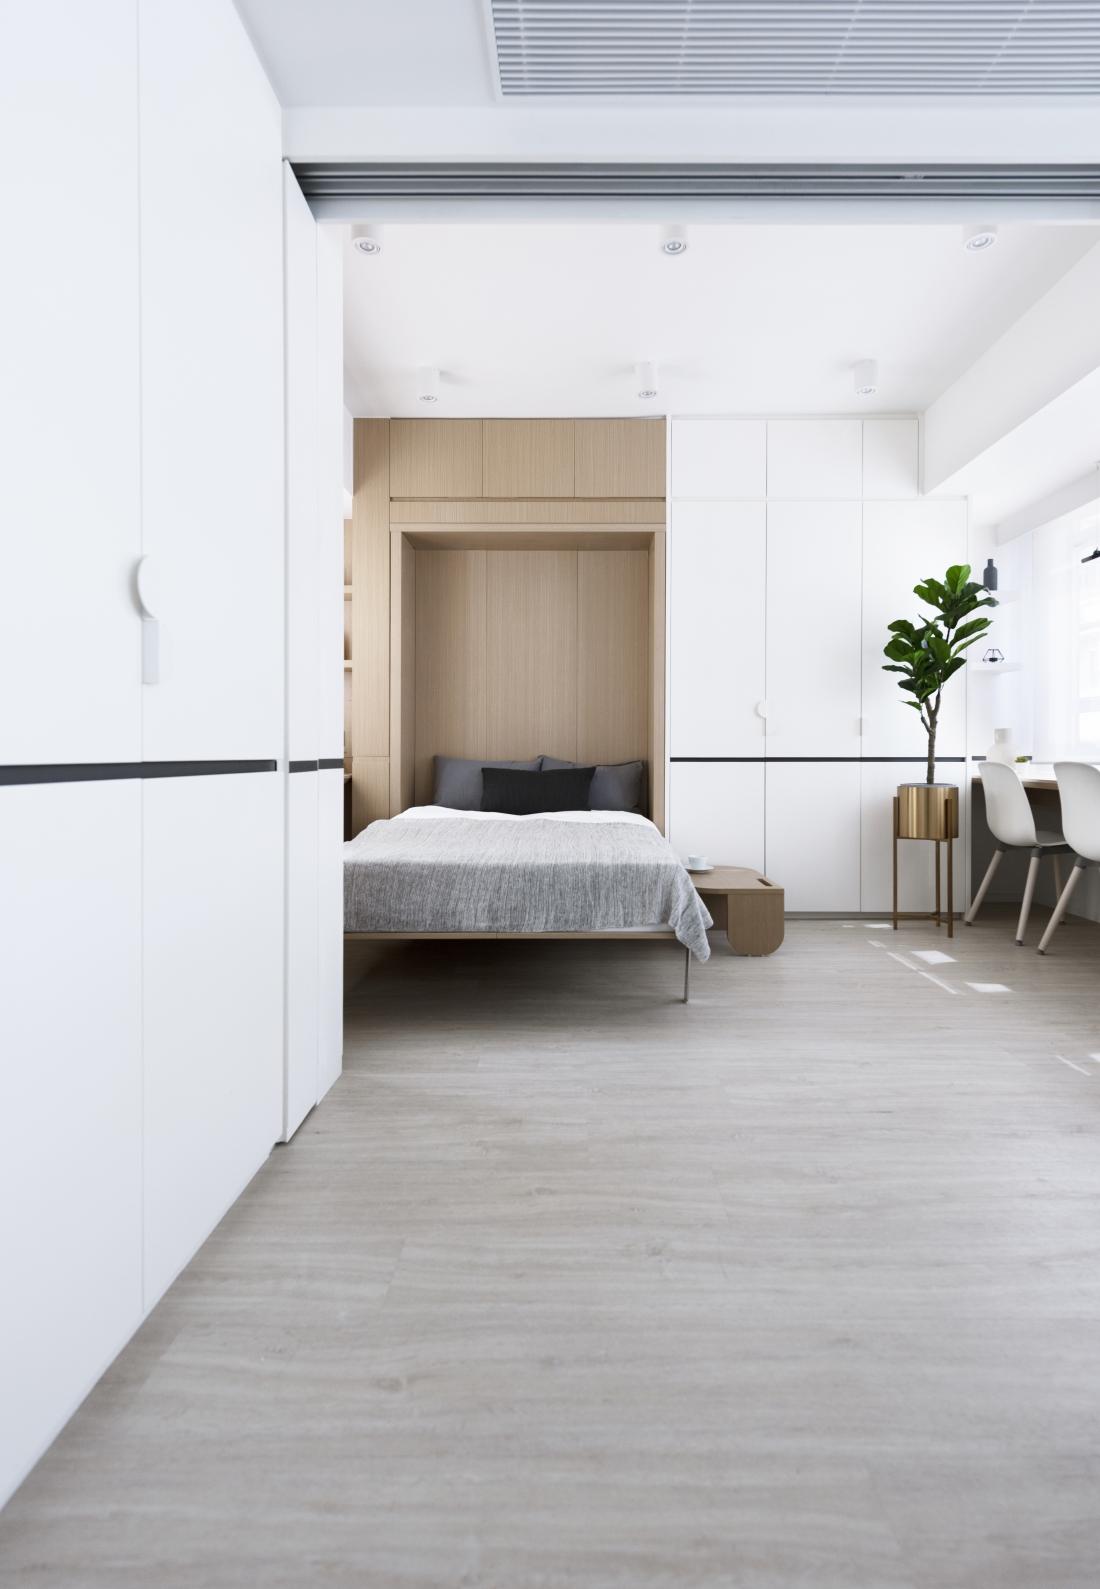 Bizhouse- Live+Work Apartments by Bean Buro.